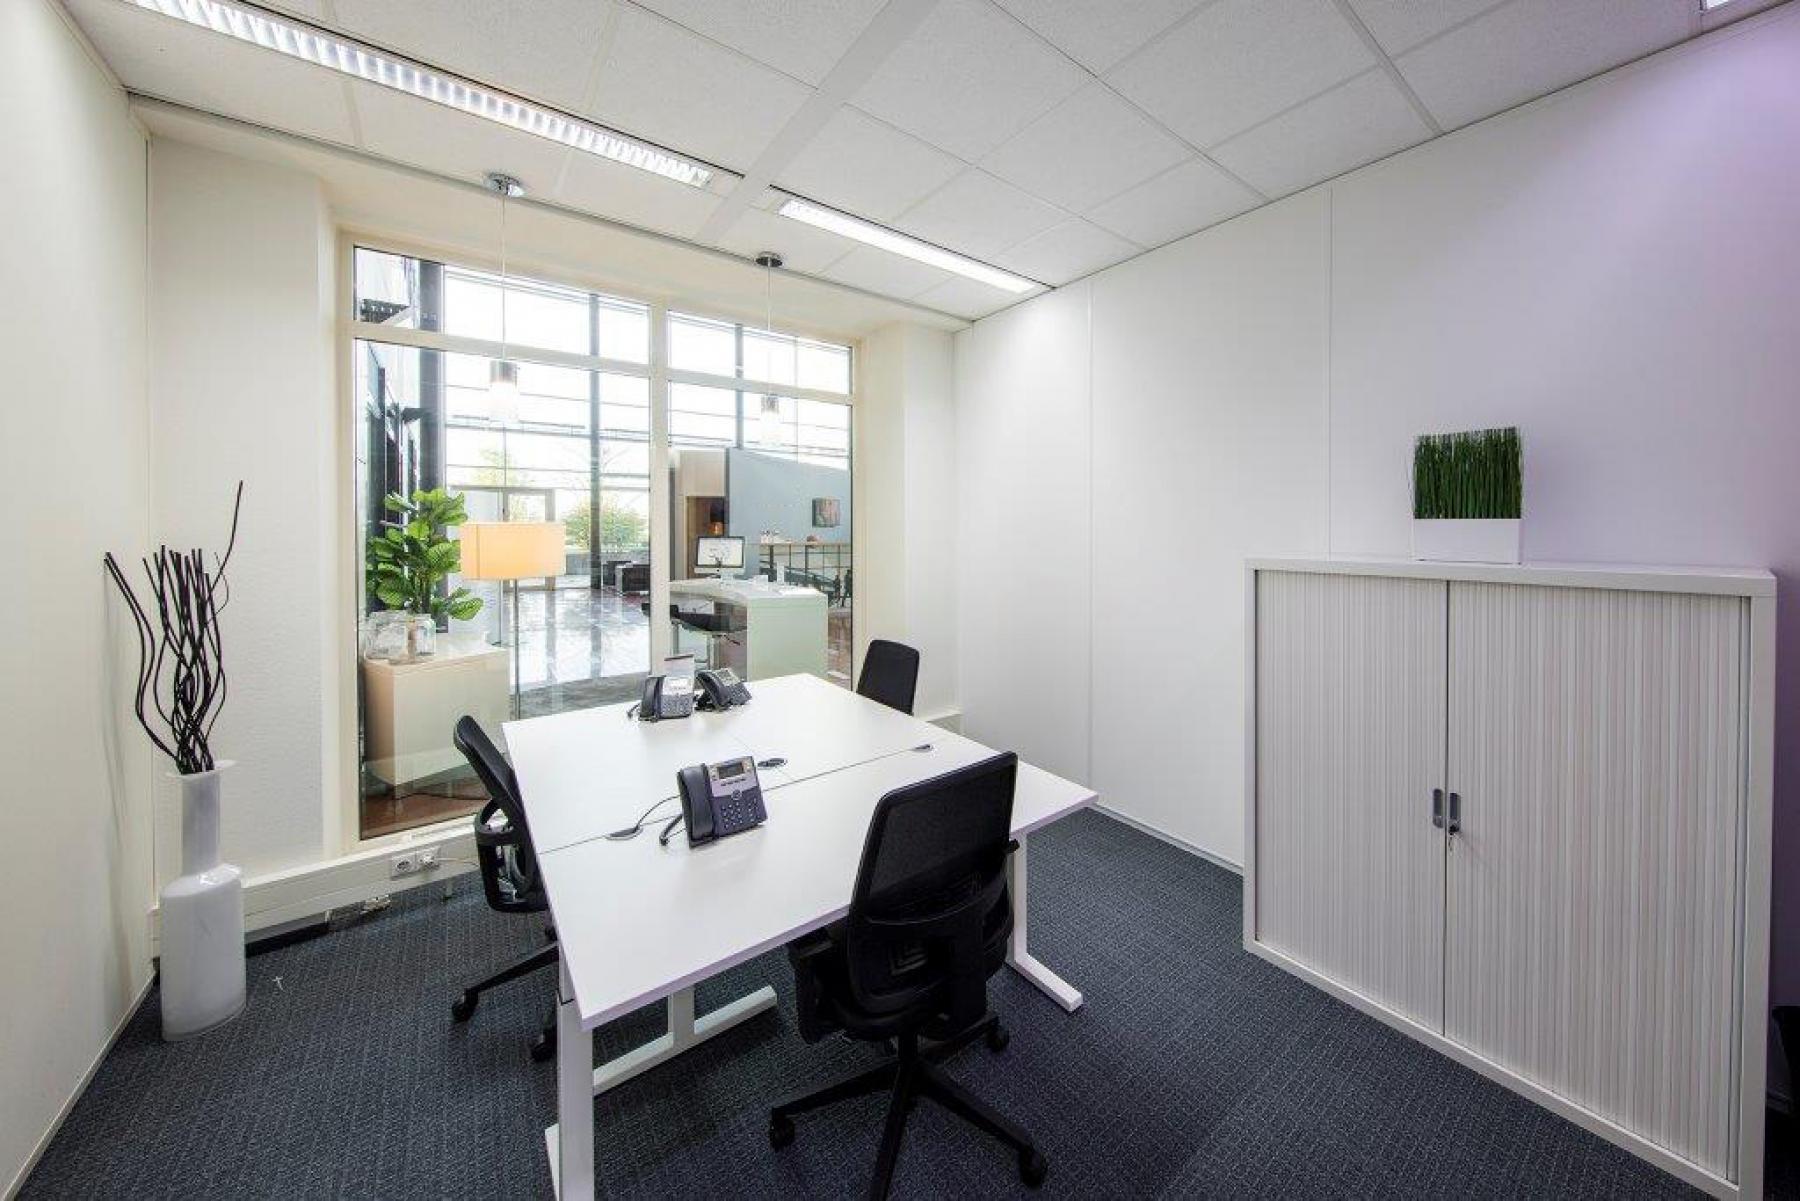 Rent office space Beechavenue 54-62, Schiphol (26)